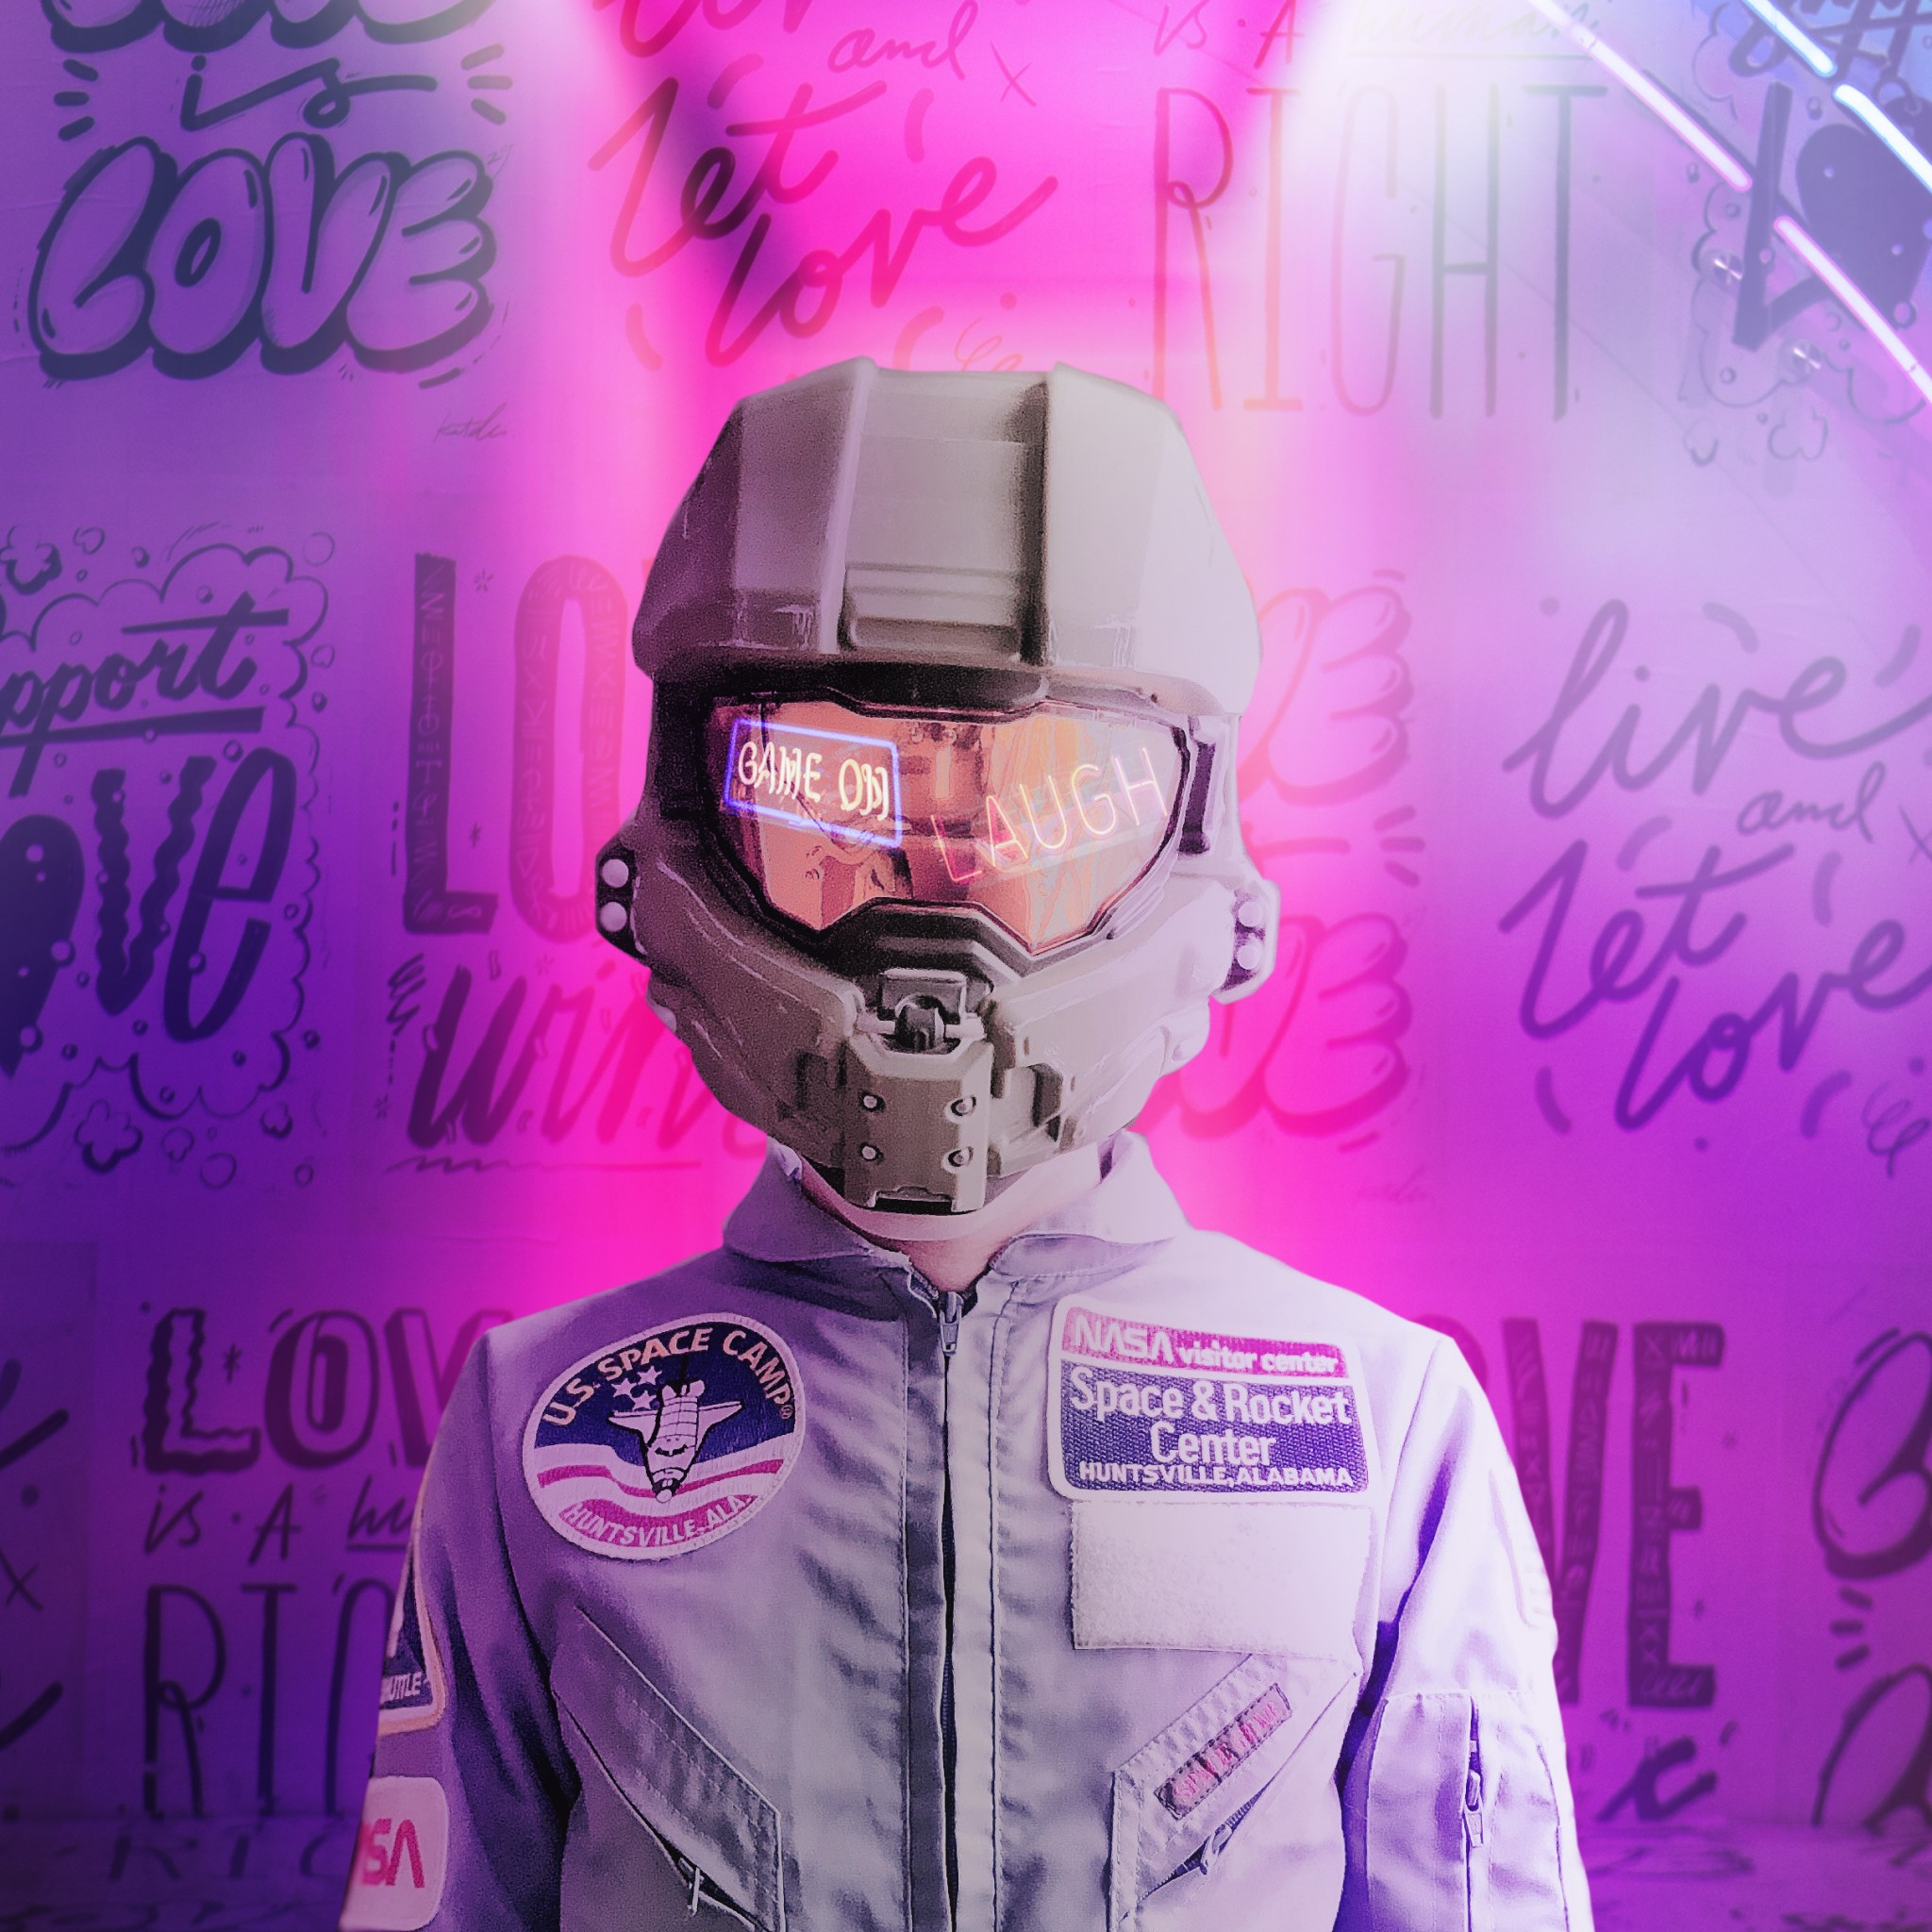 astronaut 2048x2048 space suit nasa hd 18477